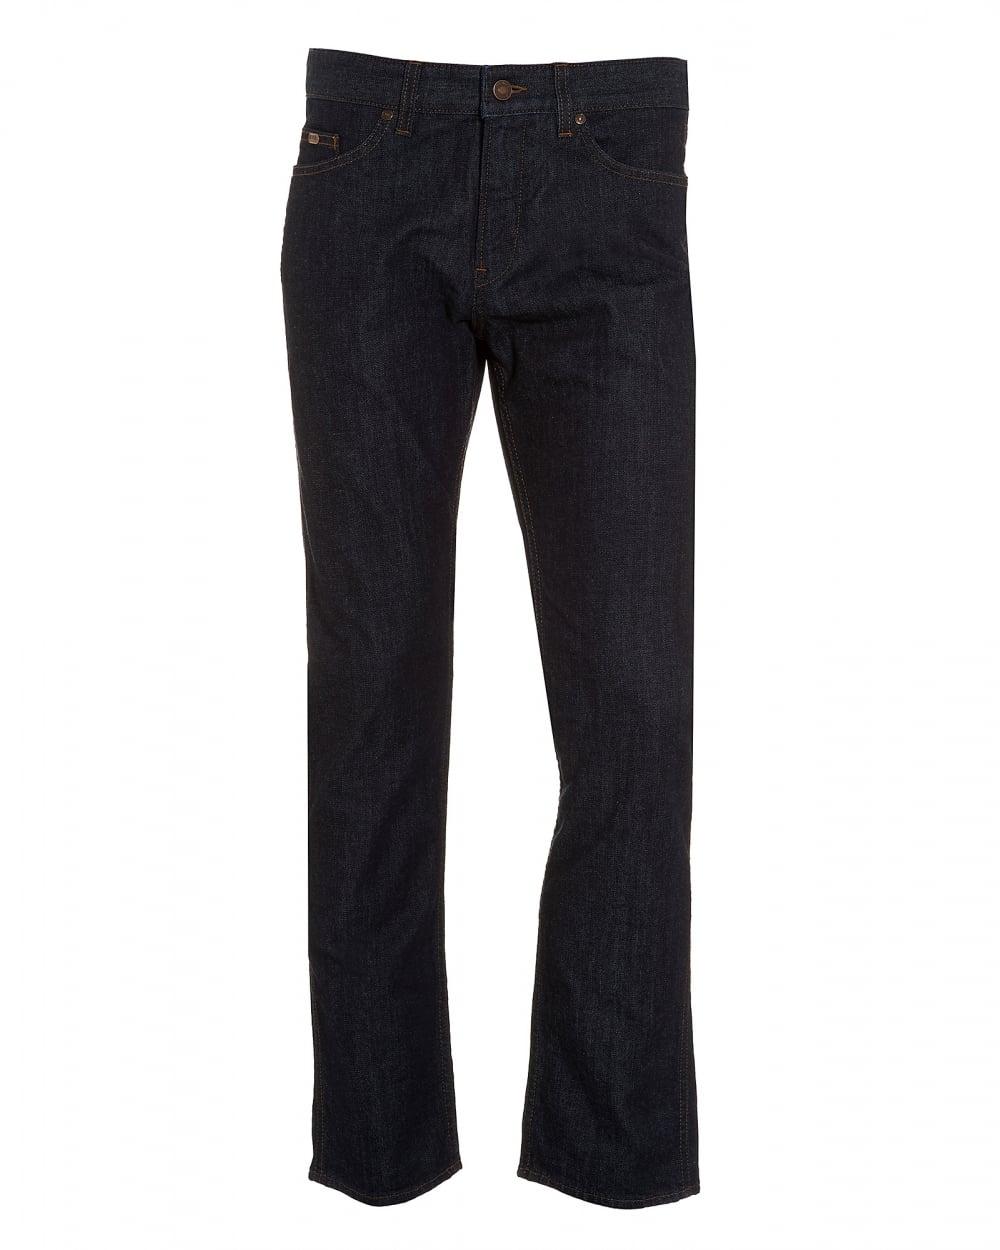 2284680ddde40 Hugo Boss Green Mens C-Delaware1 Jean, Slim Fit Dark Indigo Jeans